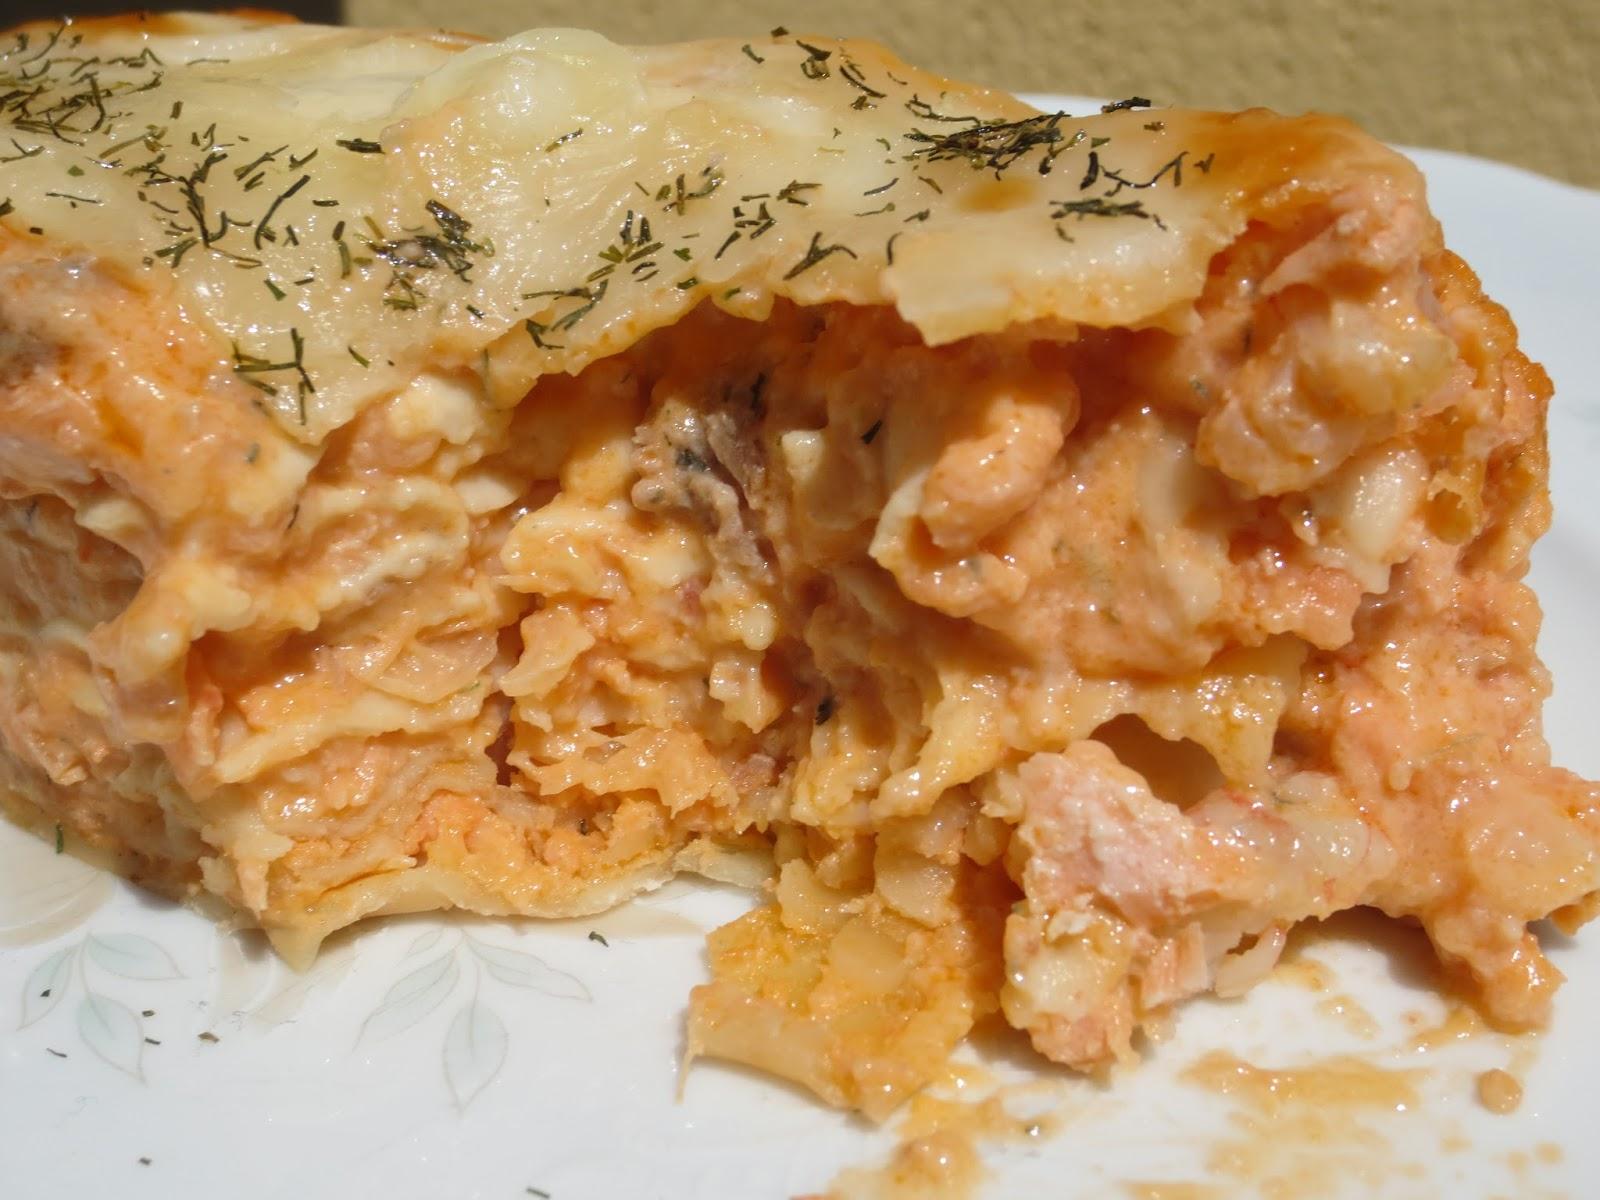 lasa a de salm n y gambas On lasana de salmon